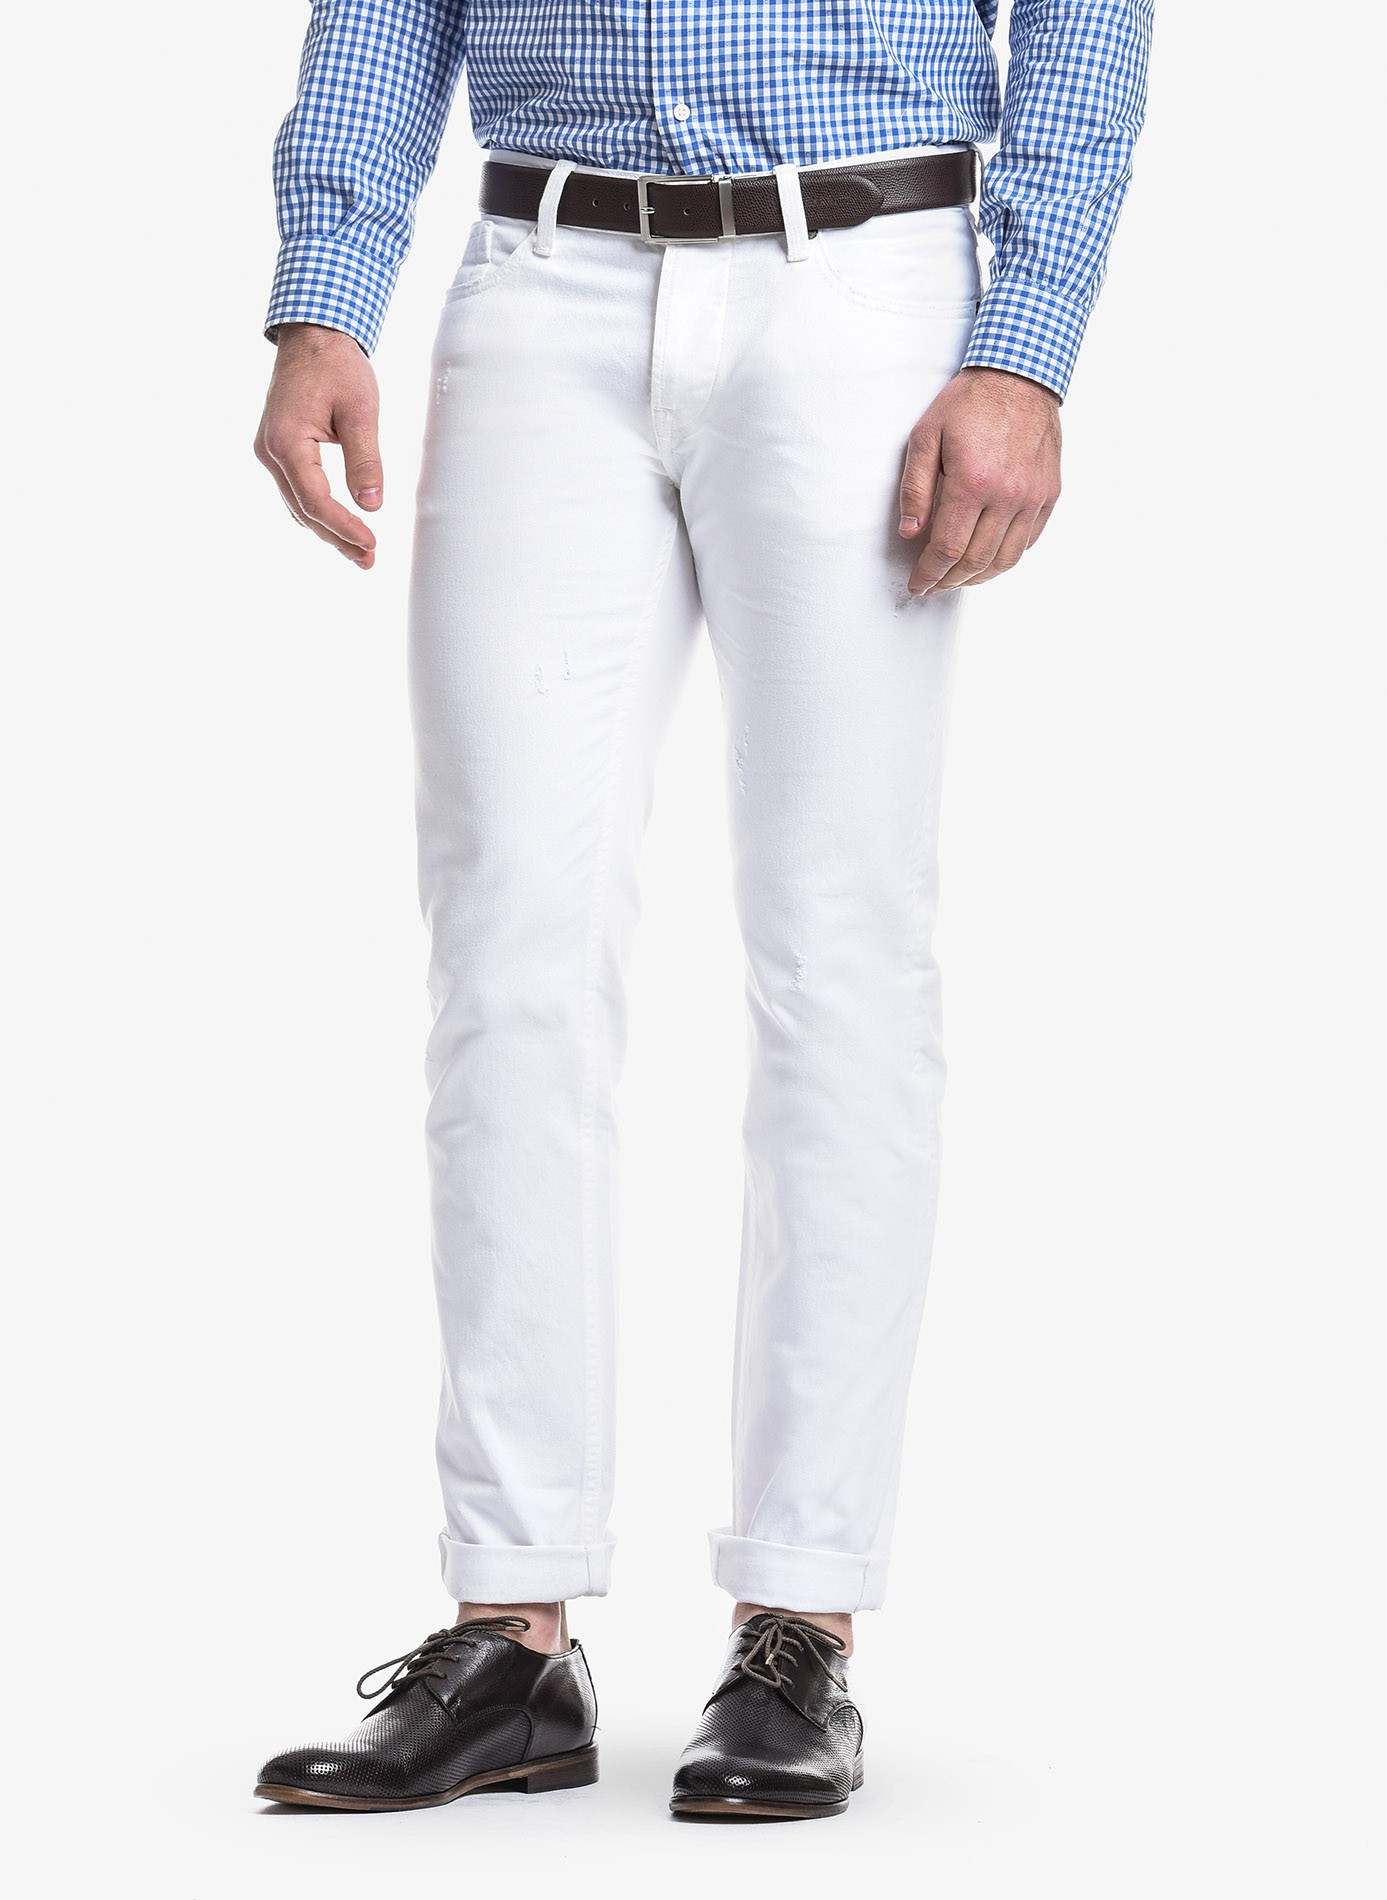 67247133 John Barritt man five pockets jeans, slim fit, in stretch denim ...